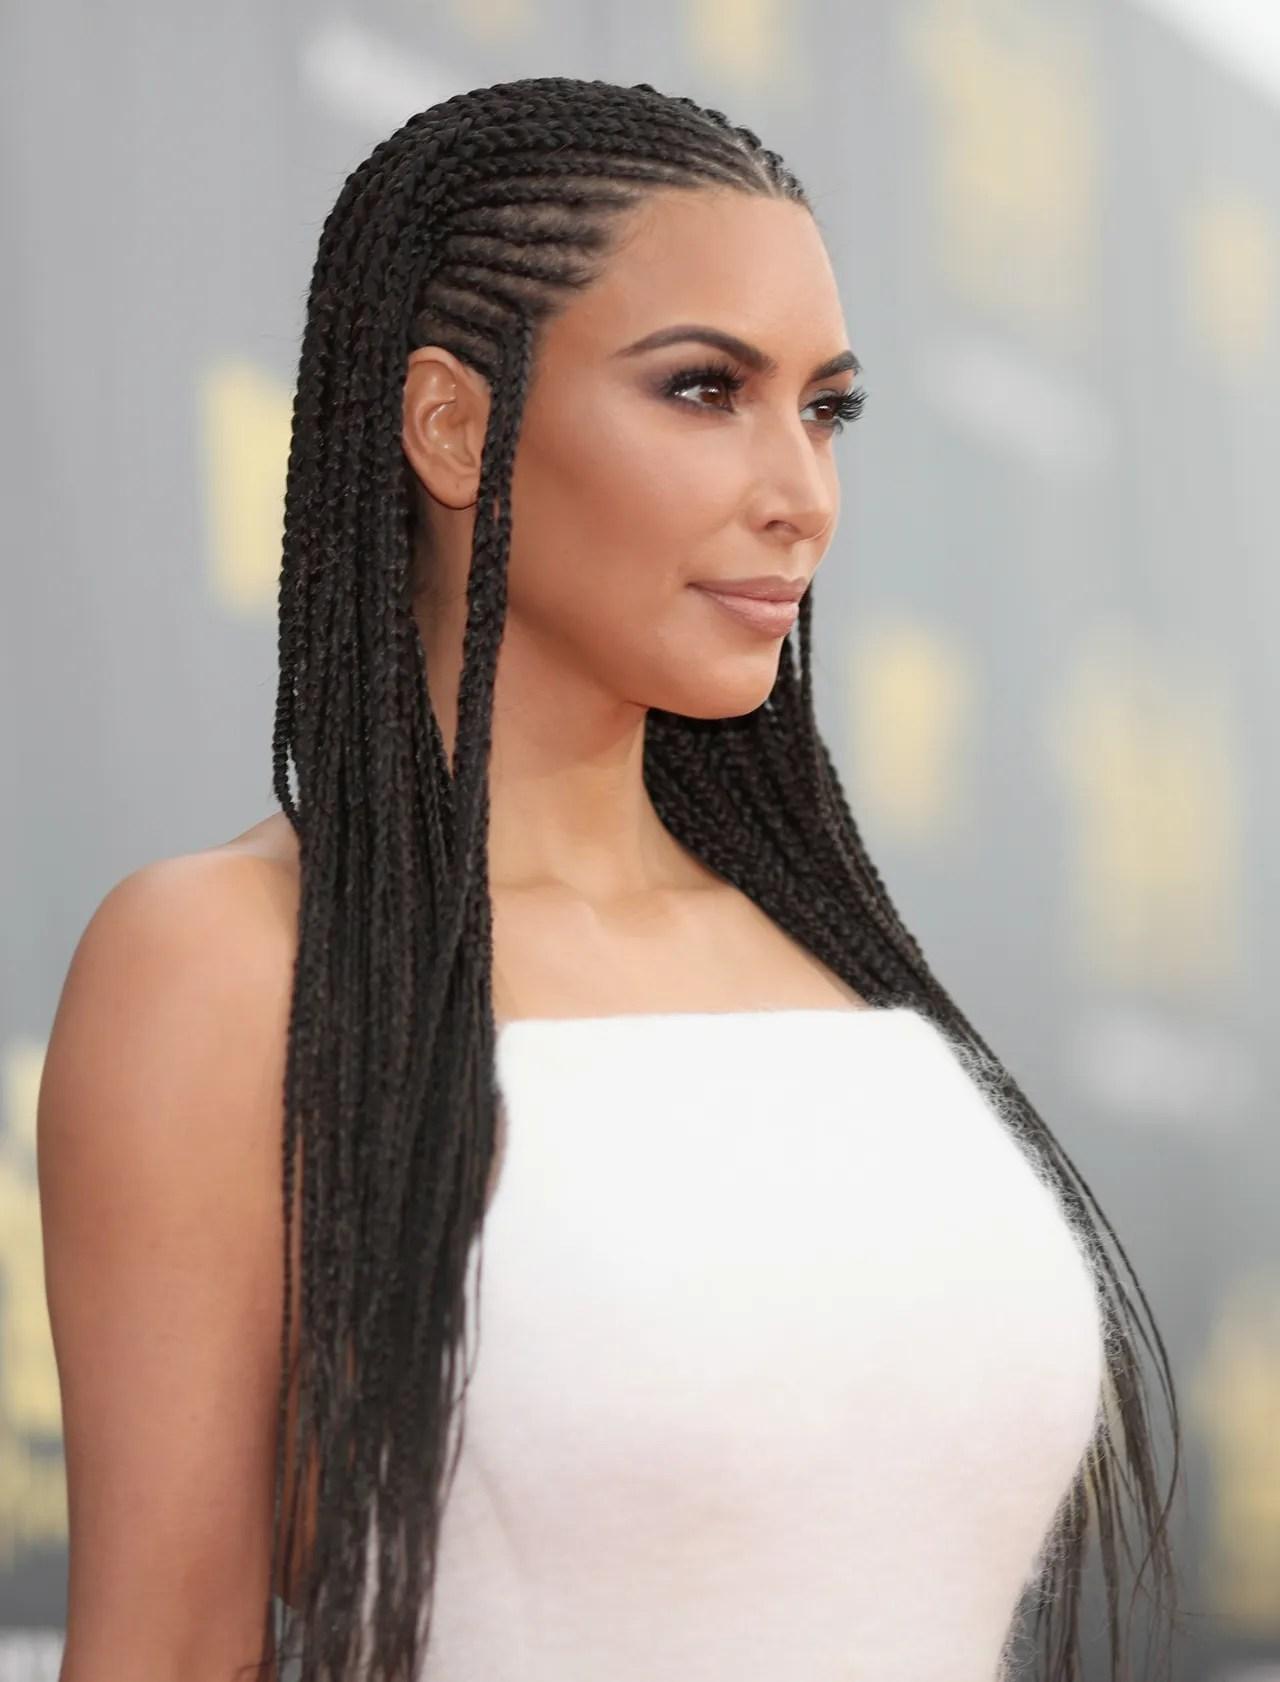 Kim Kardashian West Responds To The Backlash Over Her